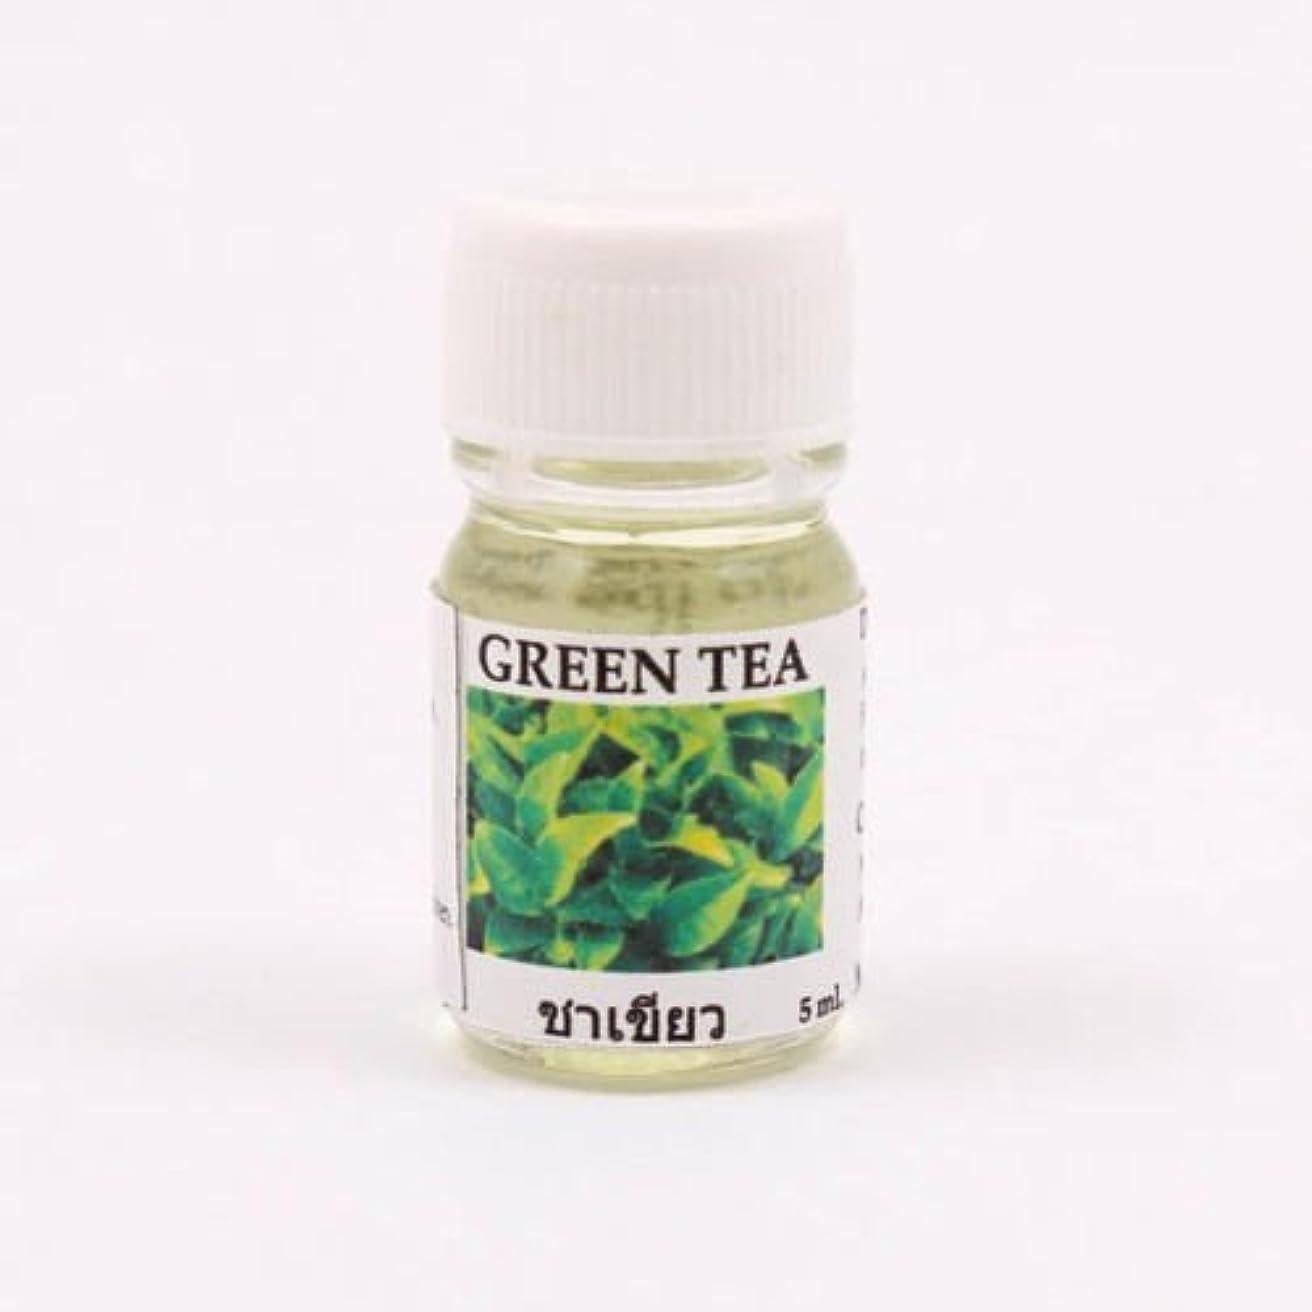 6X Green Tea Aroma Fragrance Essential Oil 5ML cc Diffuser Burner Therapy